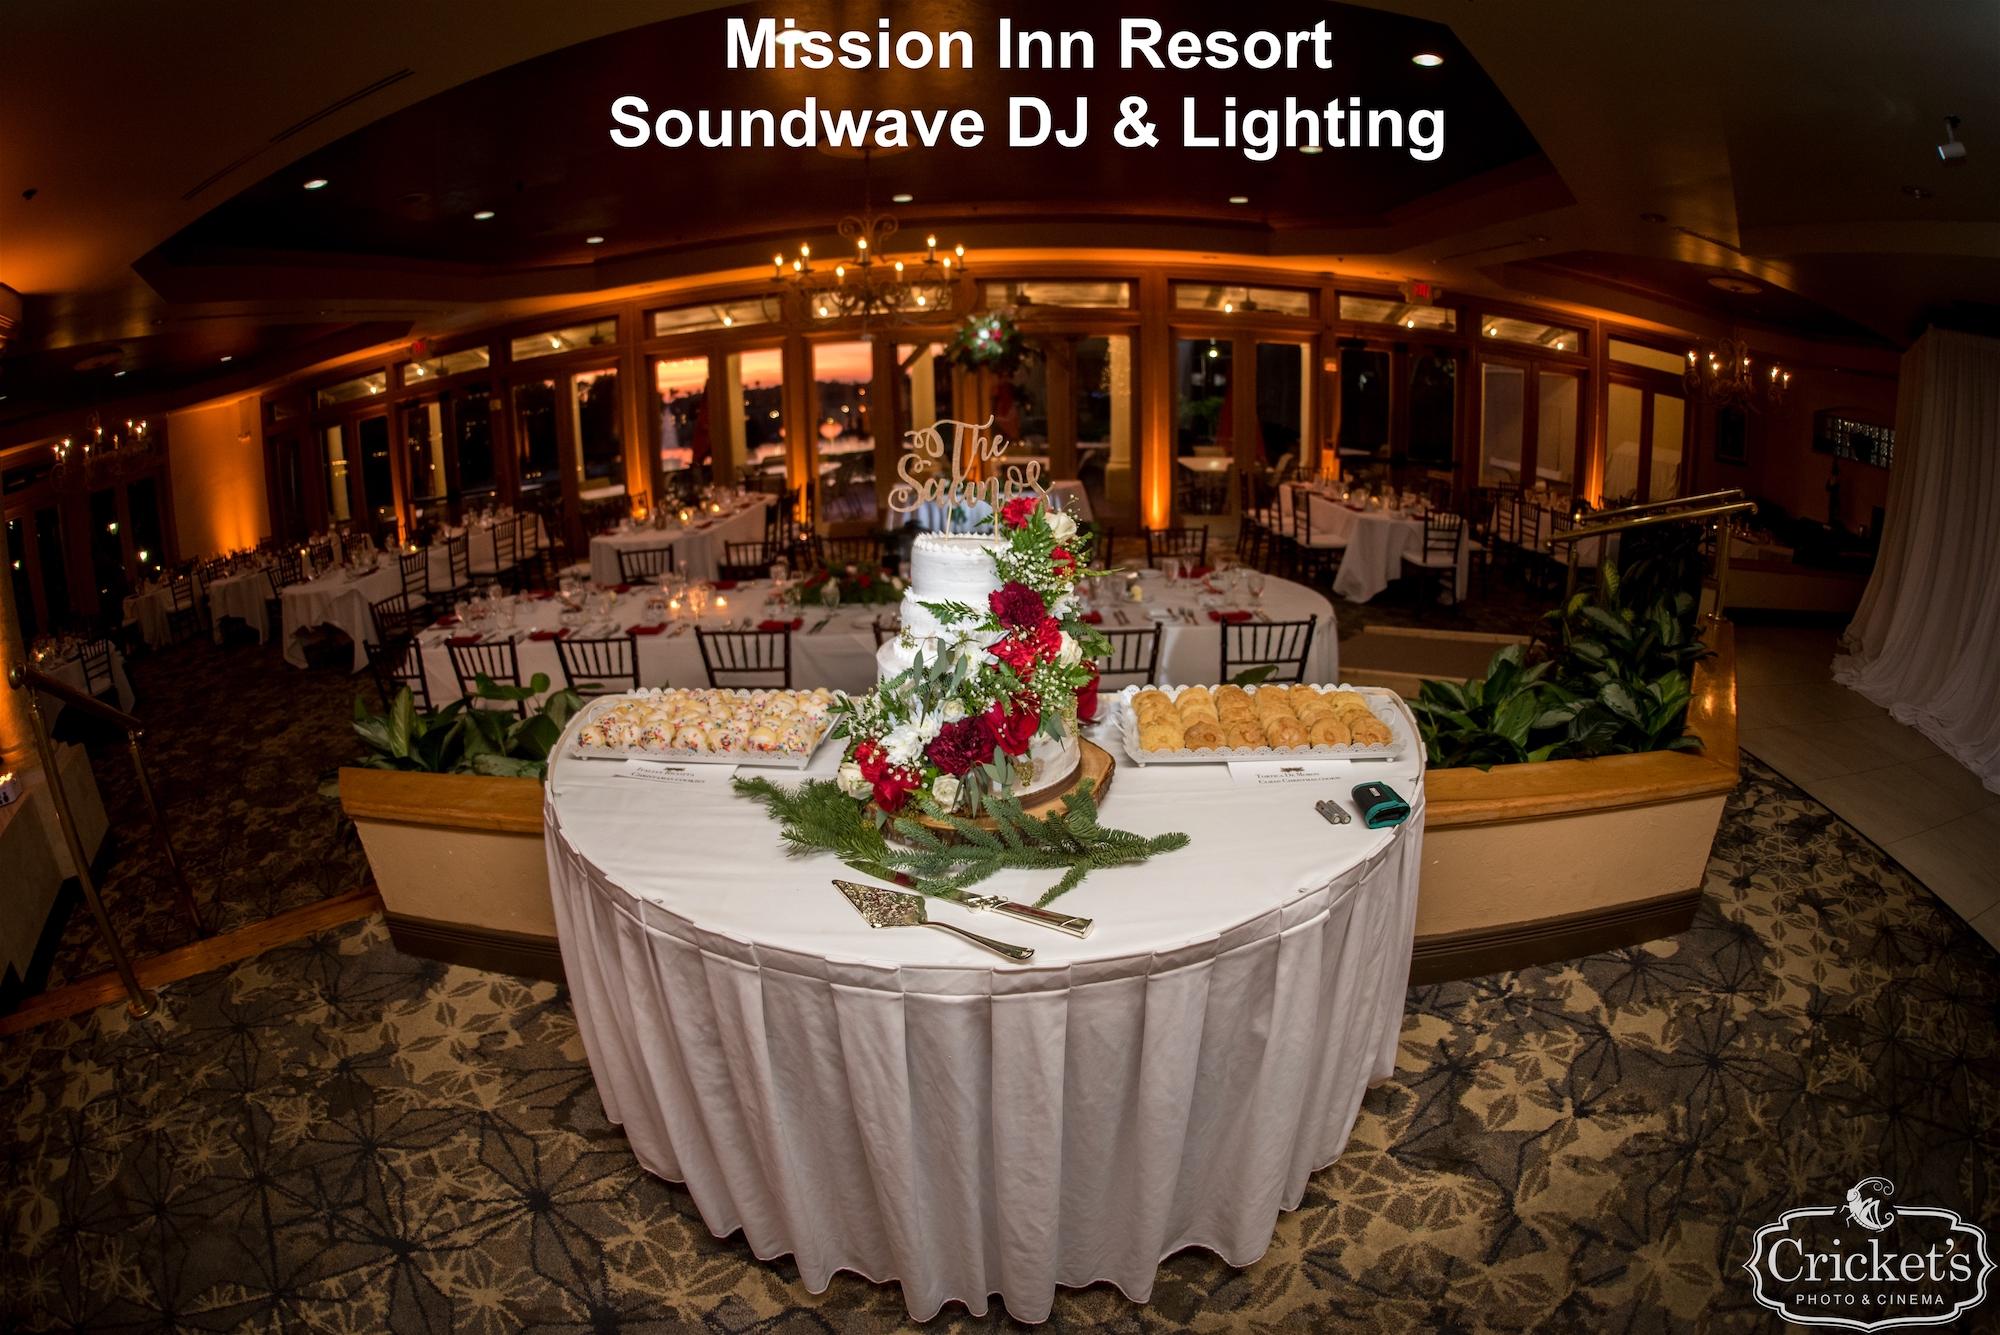 mission inn resort - orlando wedding venue - orlando wedding dj - soundwave entertainment